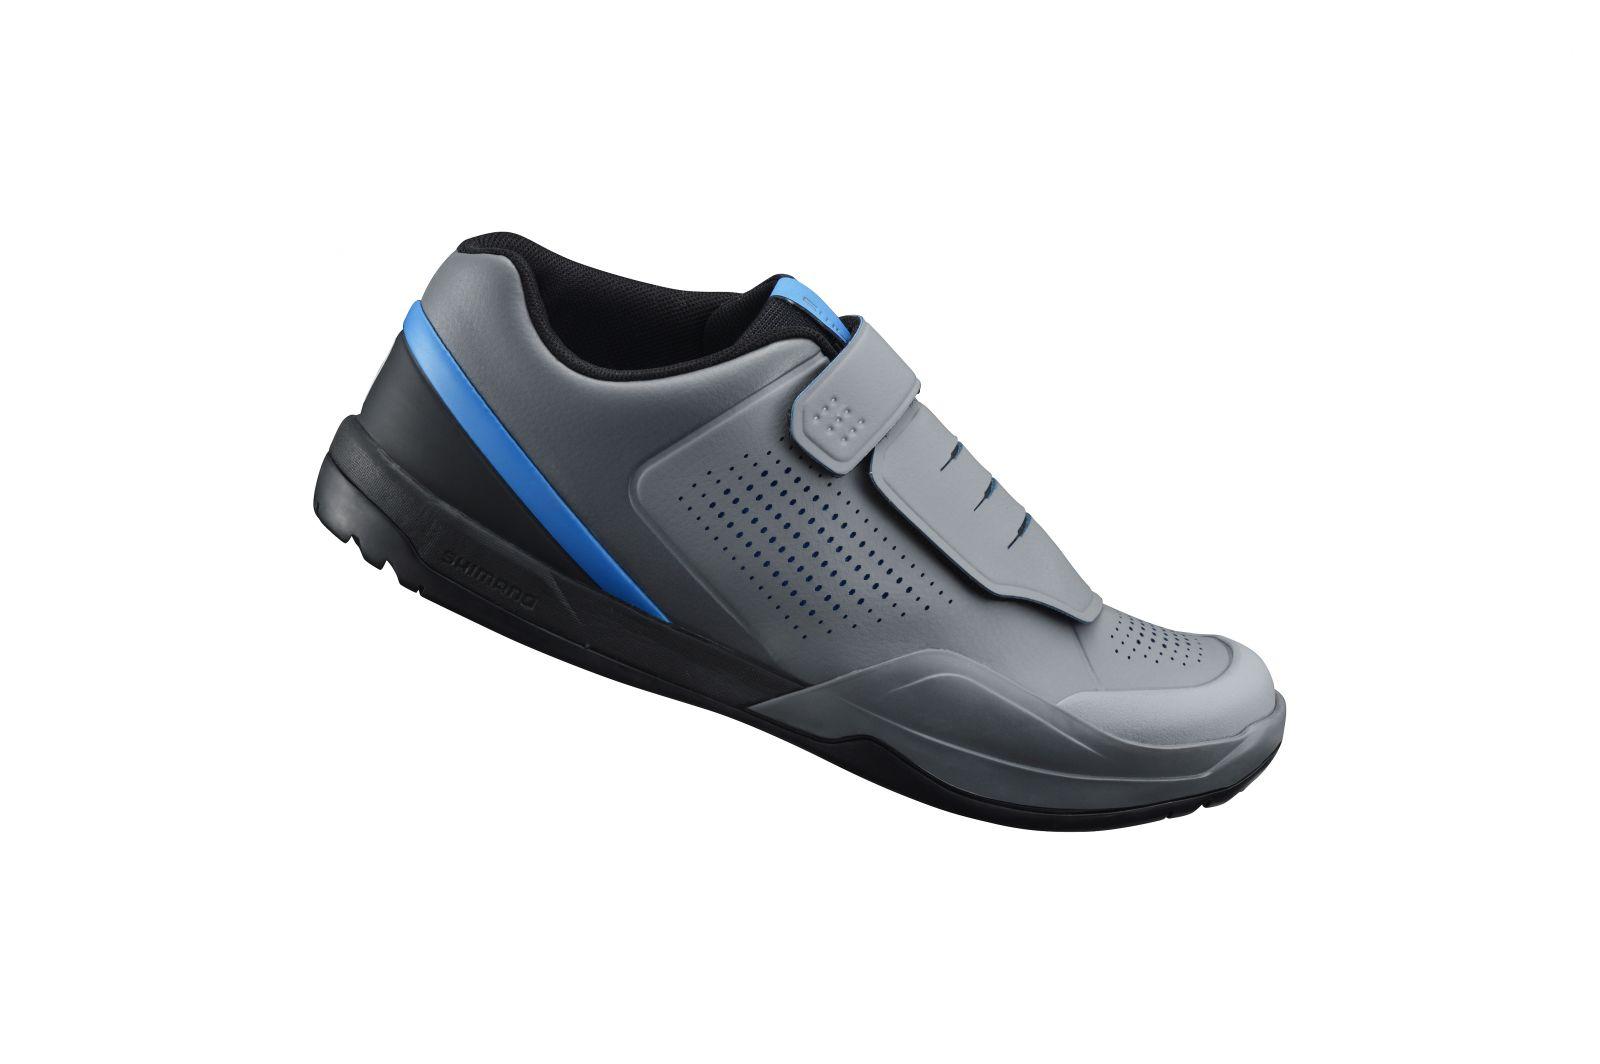 SHIMANO MTB obuv SH-AM901MG, šedá modrá, 47